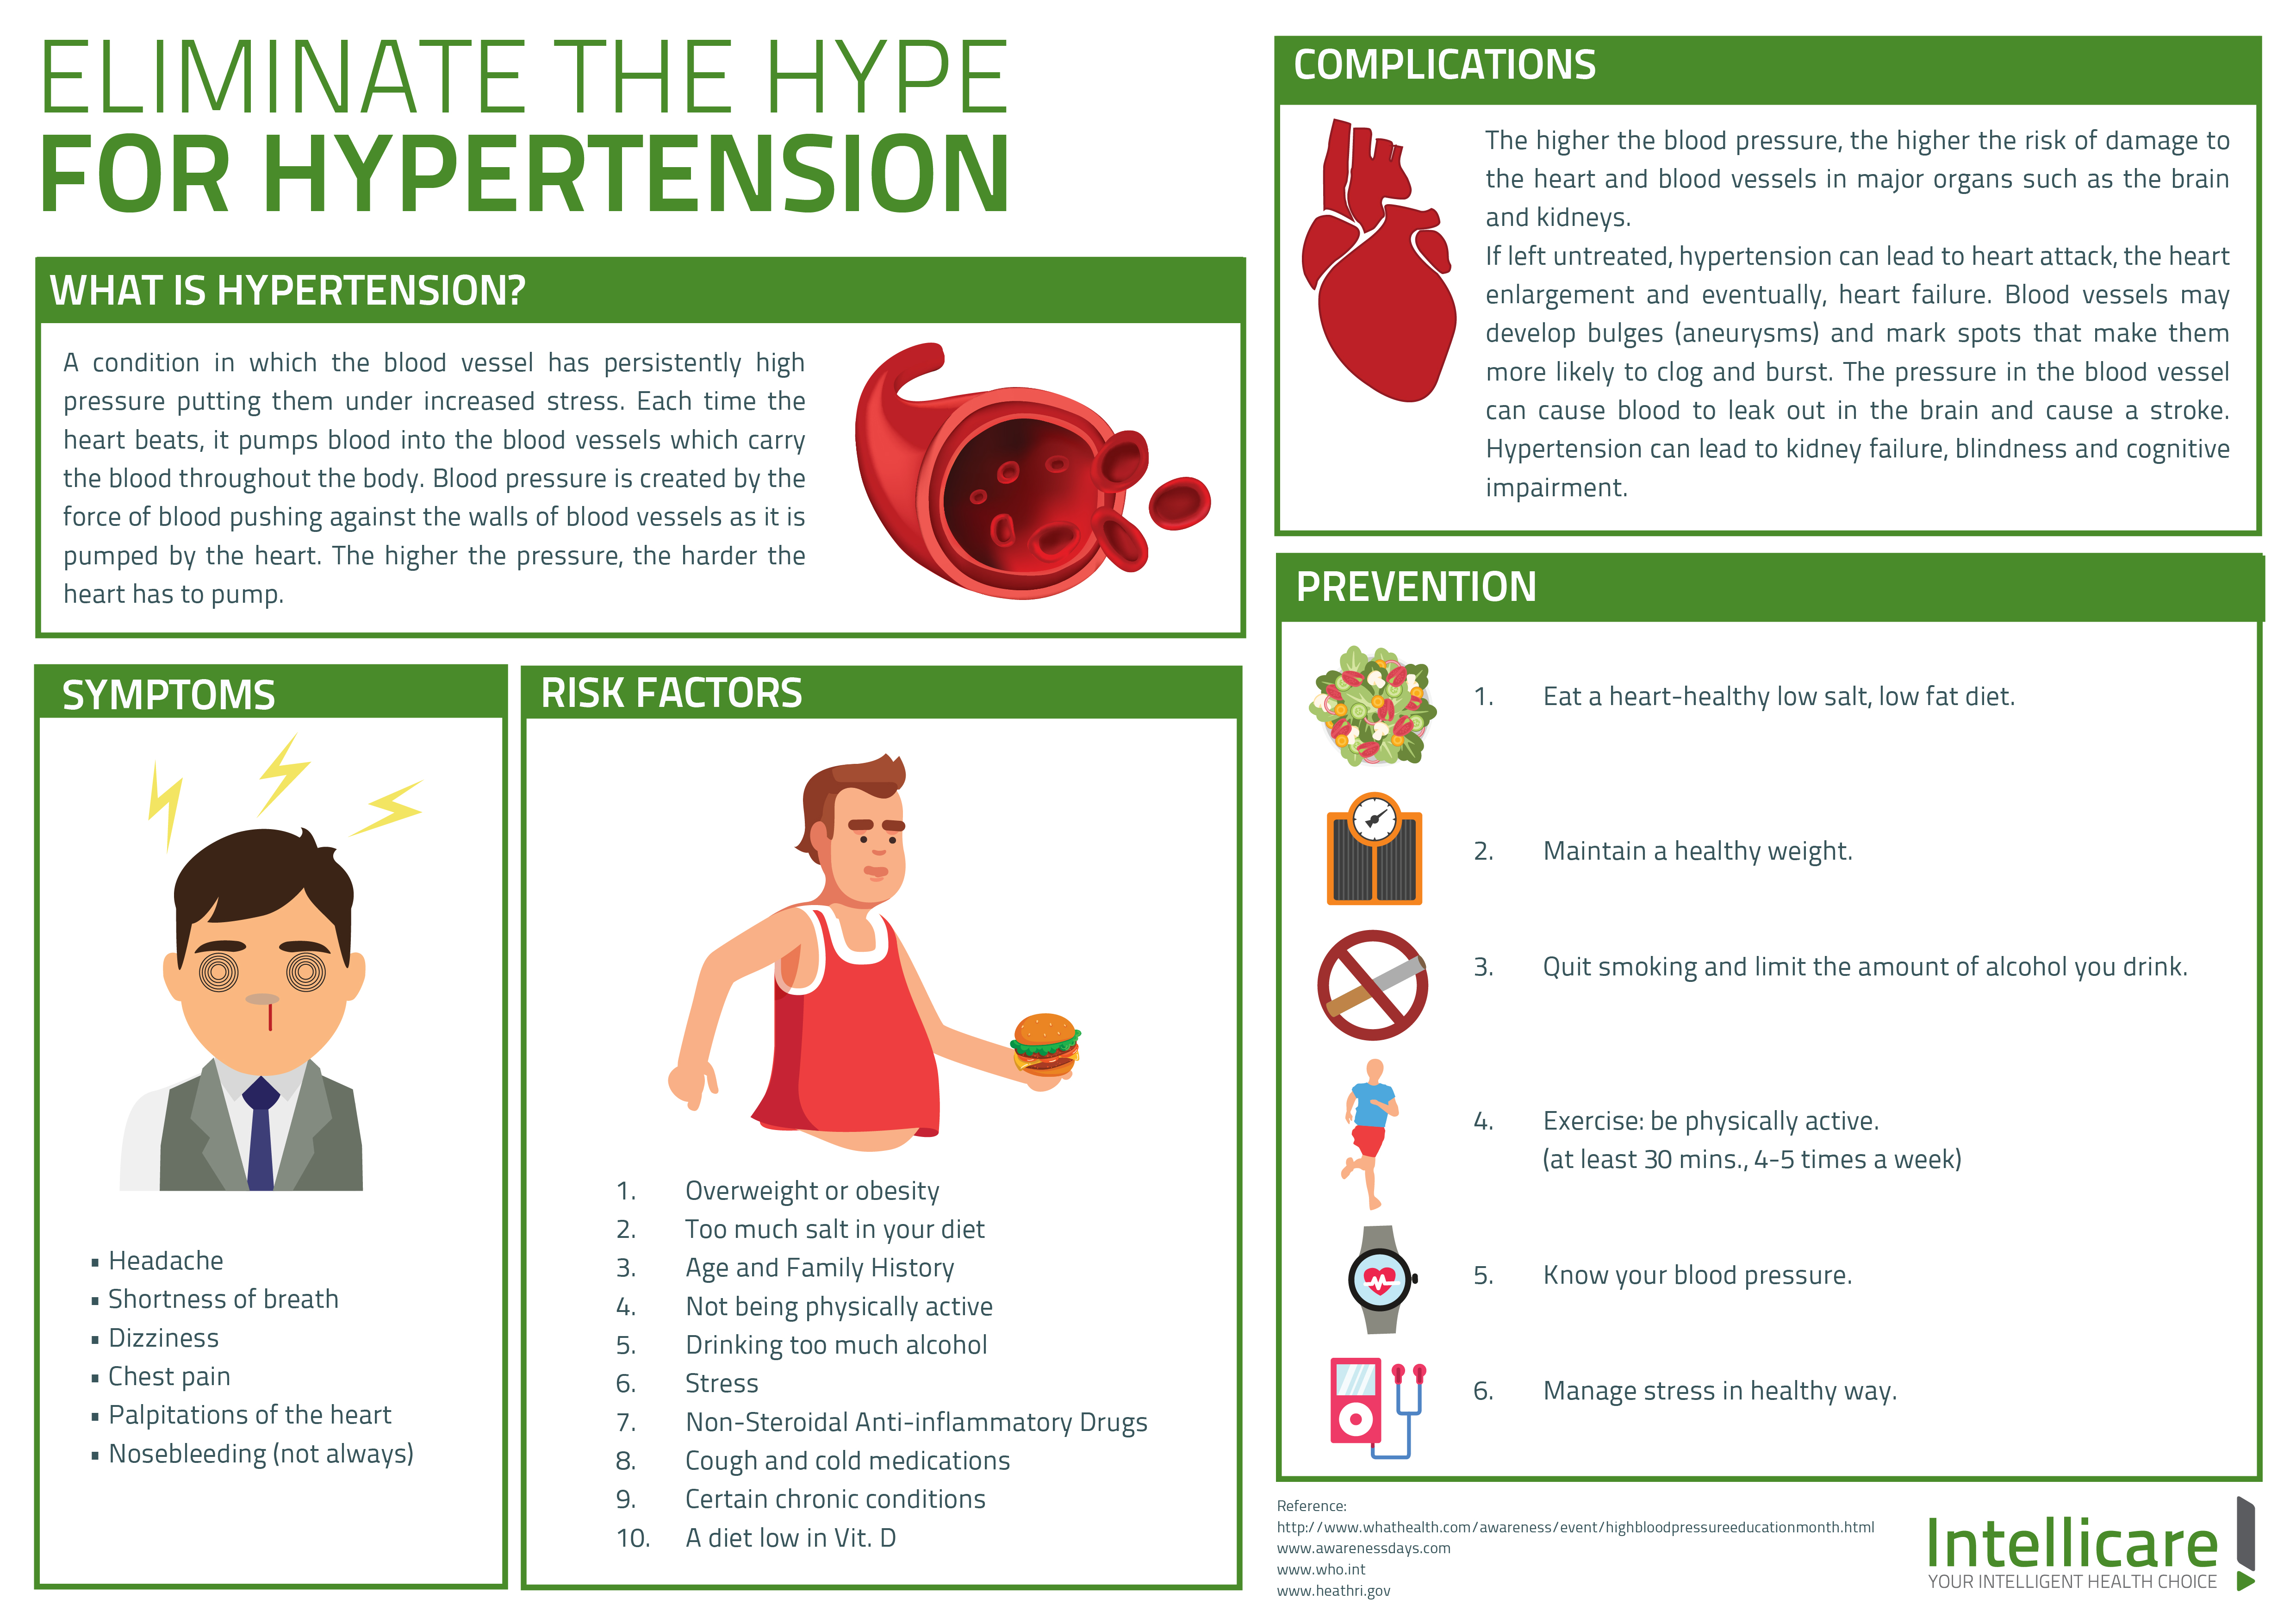 Eliminate the Hype for Hypertension - Intellicare